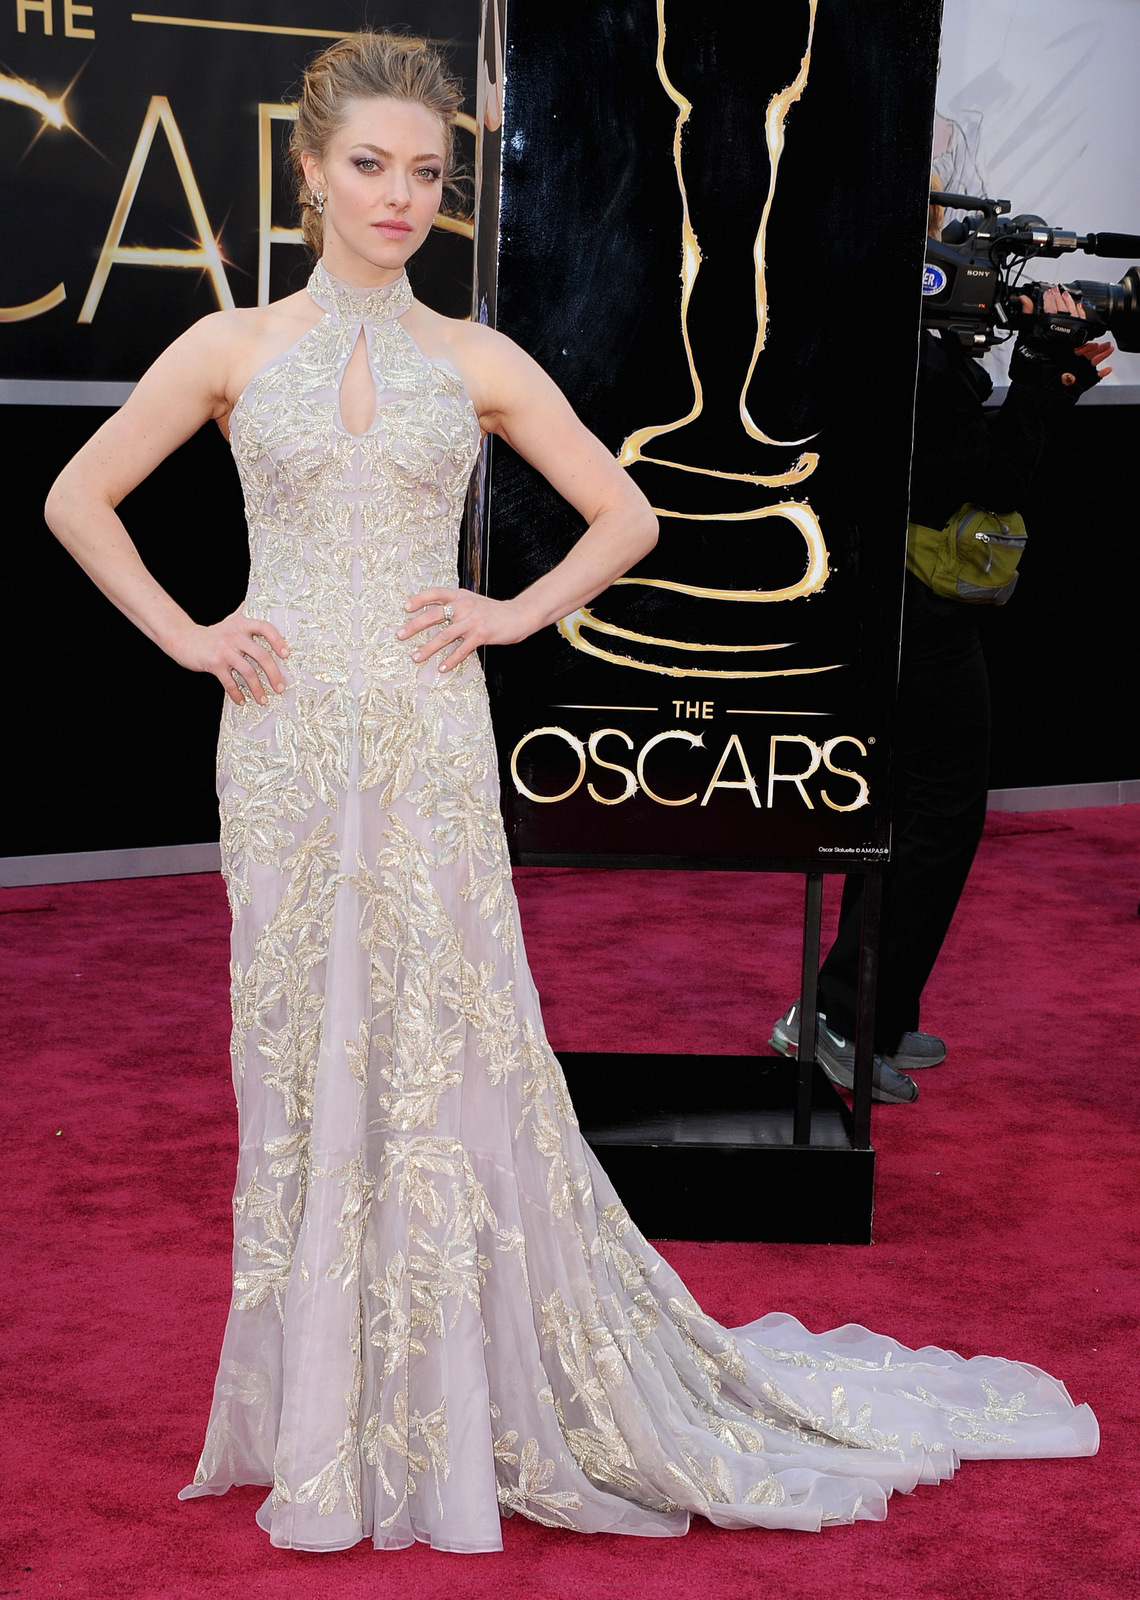 Amanda Seyfriend Oscars 2013